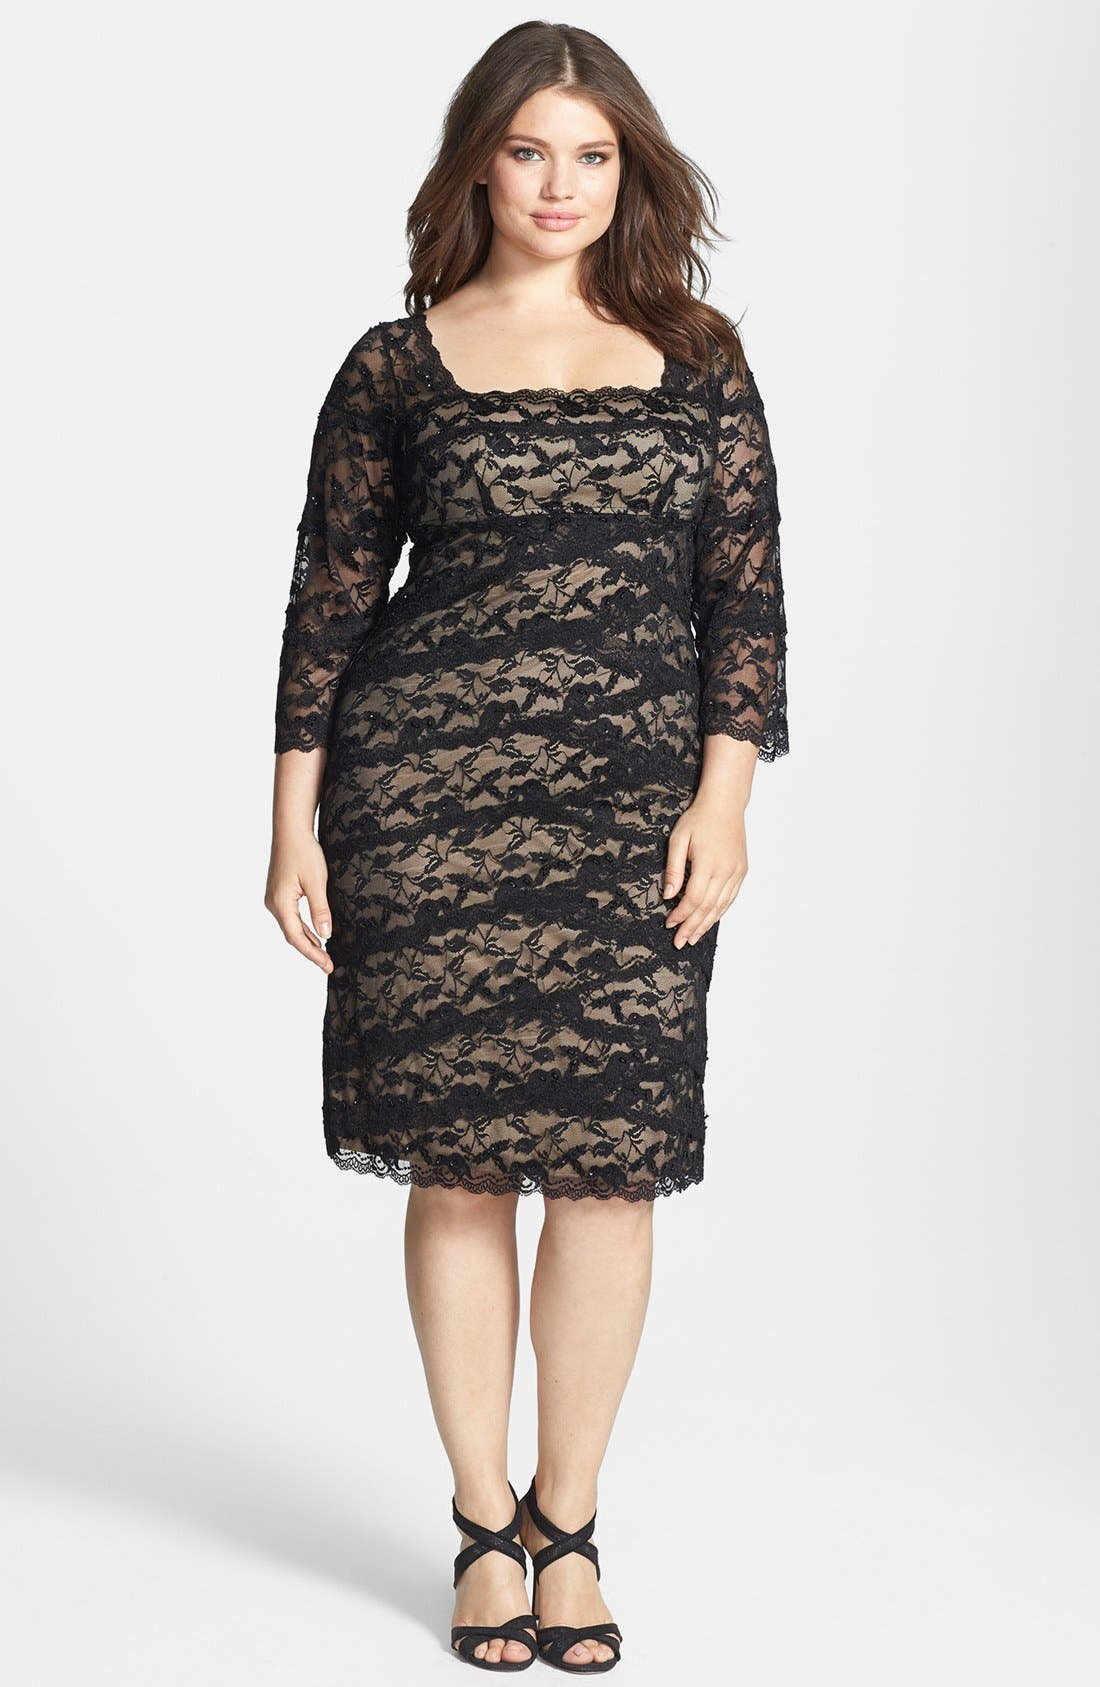 Alternate Image 1 Selected - Marina Tiered Lace Sheath Dress (Plus Size)